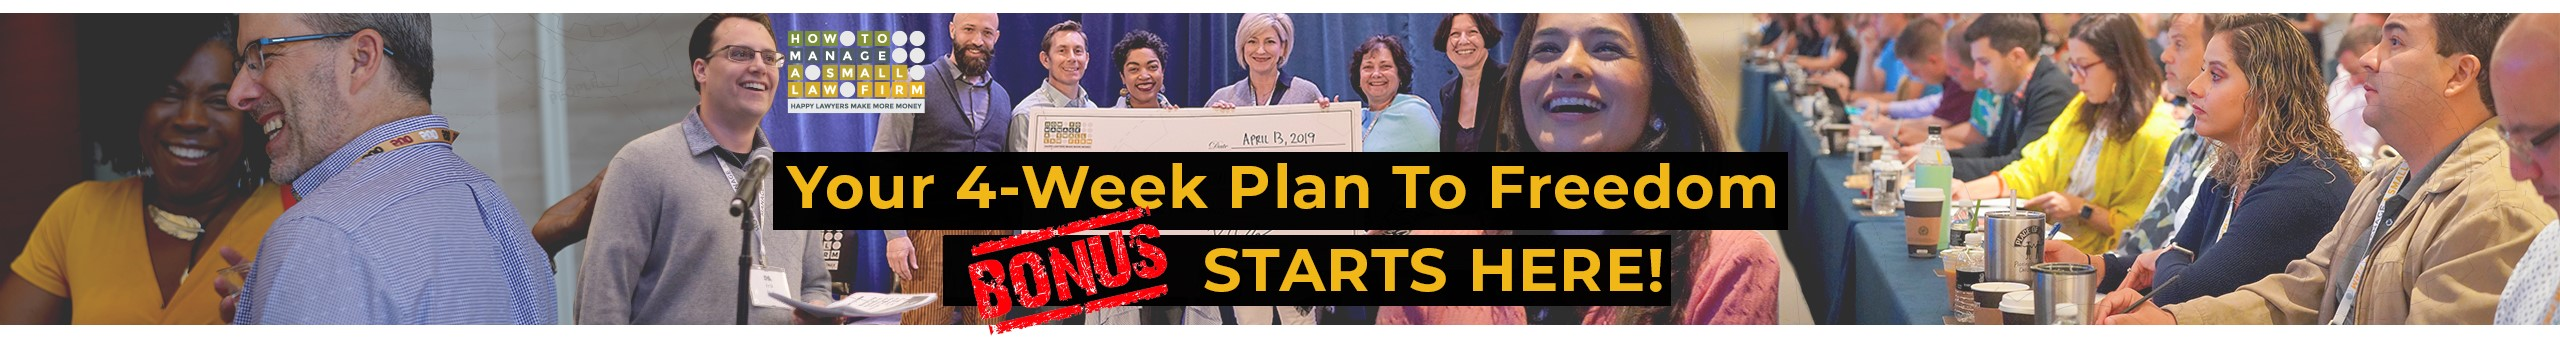 Your 4-Week Plan to Freedom Bonus Starts Here!